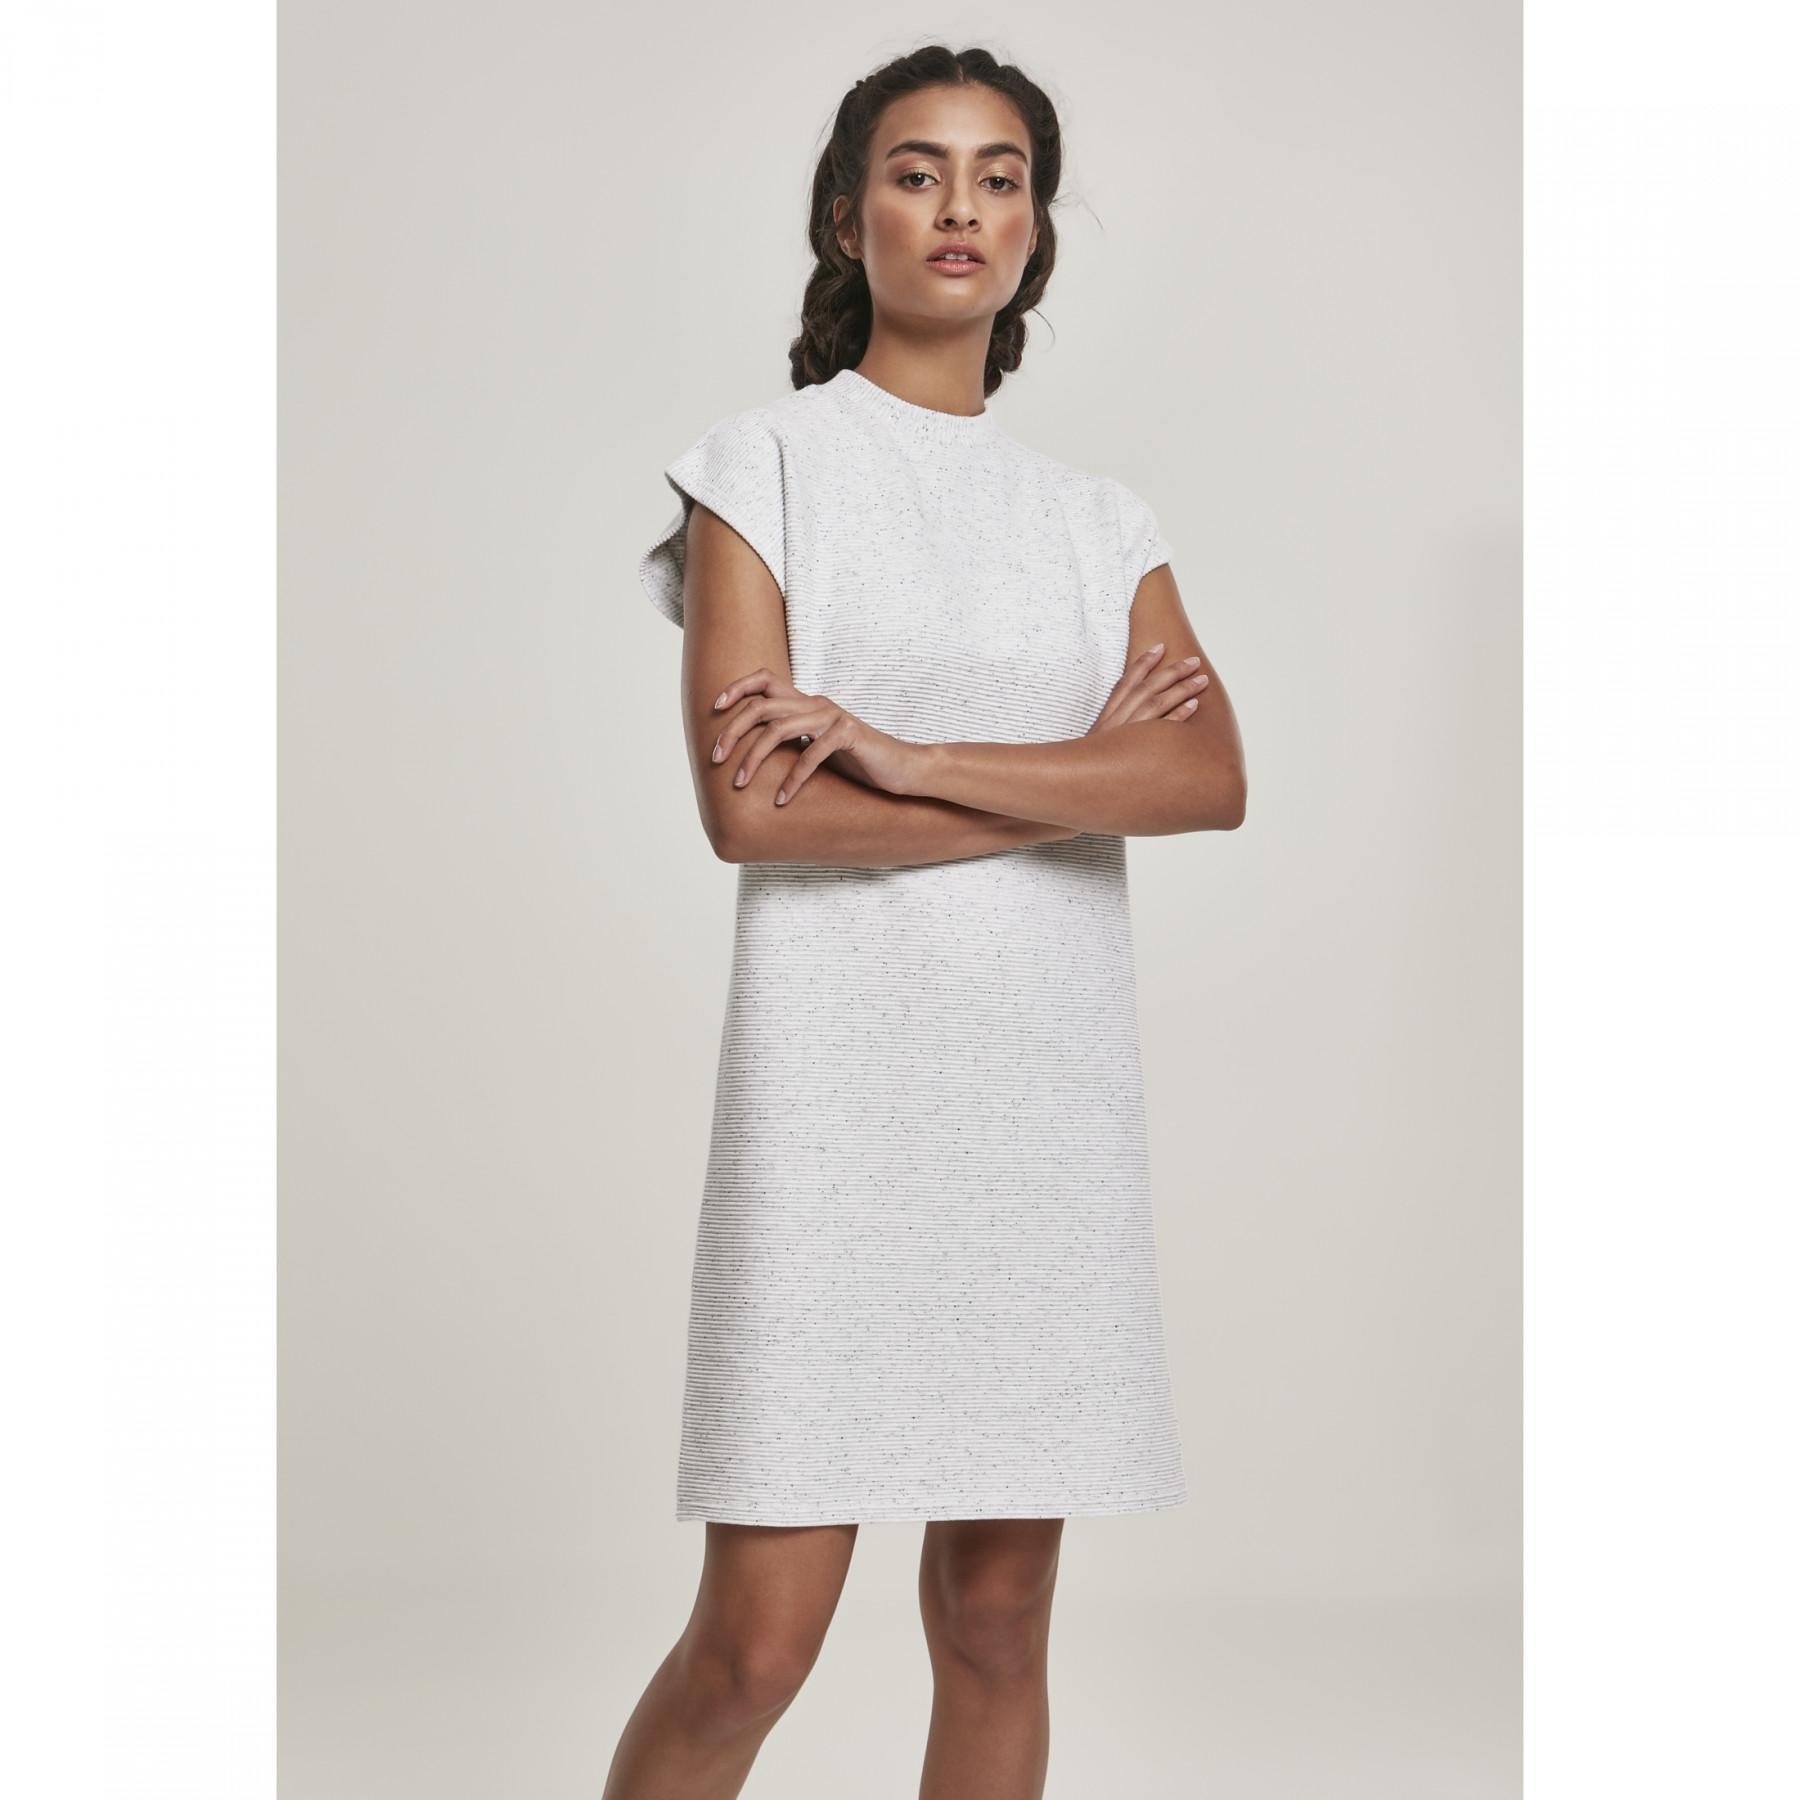 Women's Urban Classic nap terry extended dress